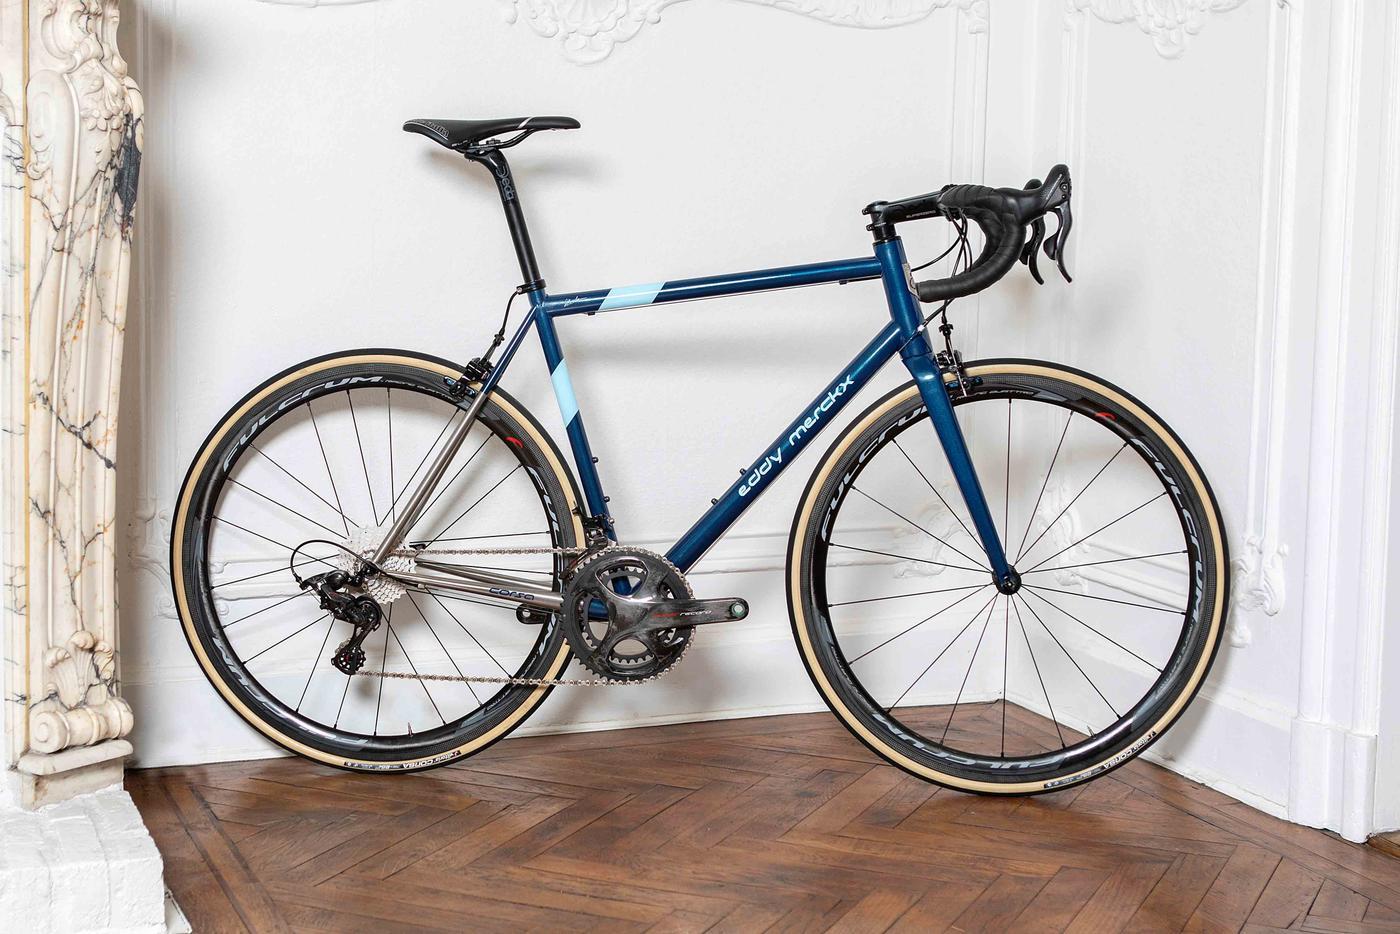 Eddy Merckx Debuts the Corsa Steel Bikes